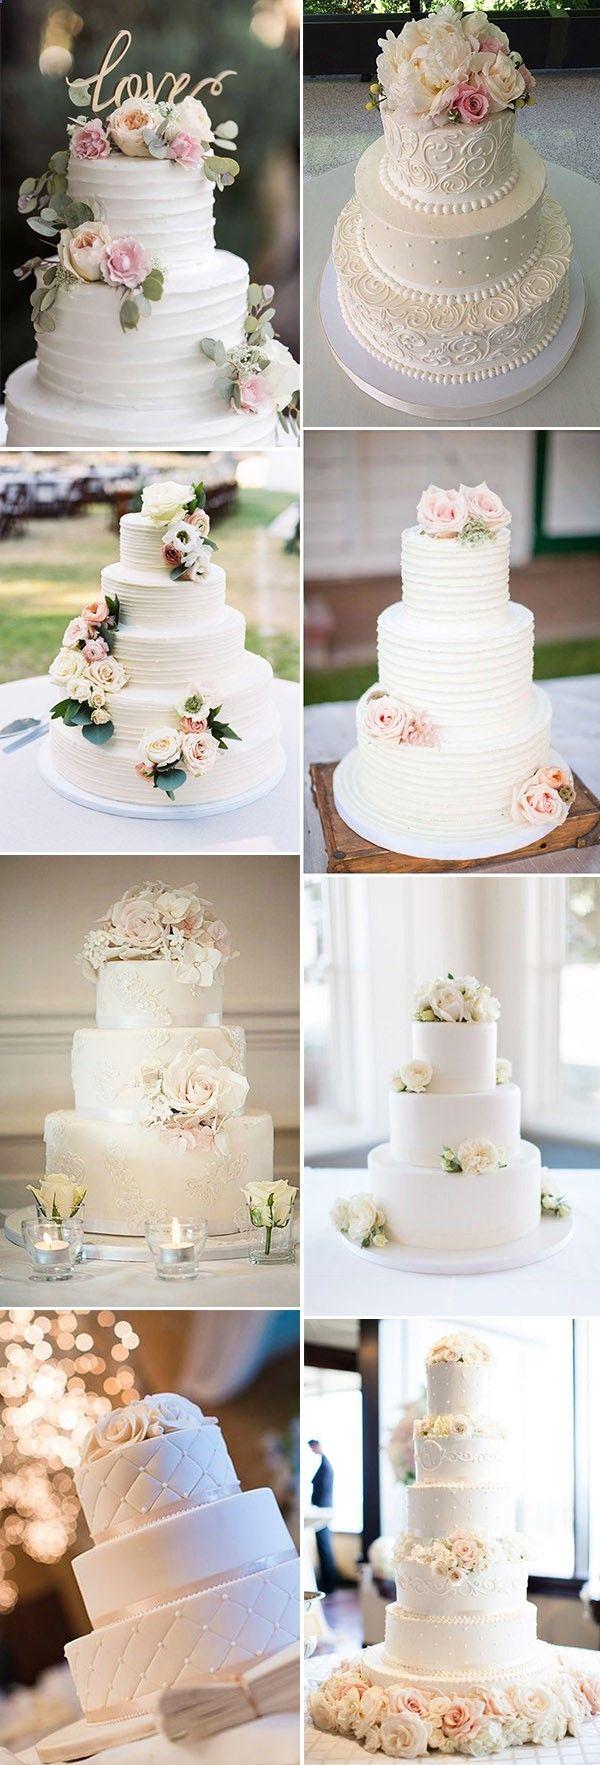 elegant and romantic wedding cake ideas | Tiered Cakes | Pinterest ...